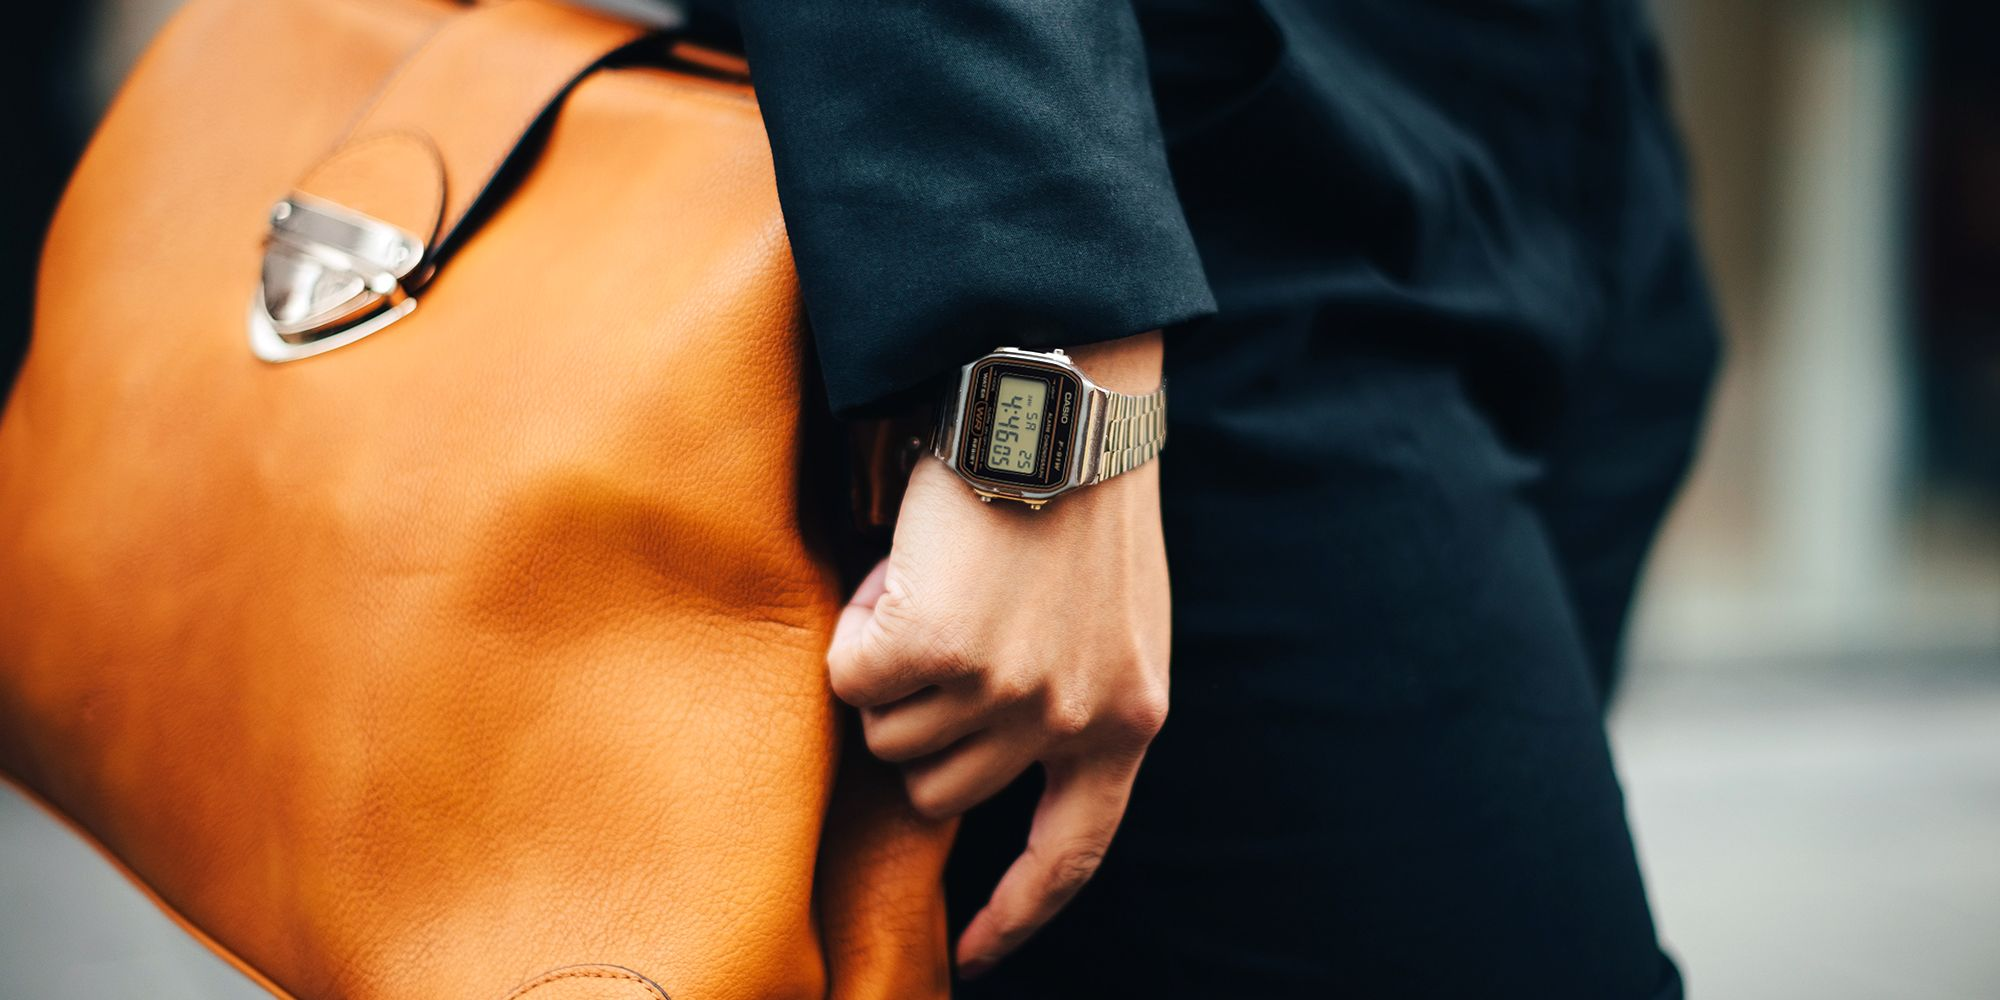 12 Best Digital Watches for Men - Digital Men's Watches to